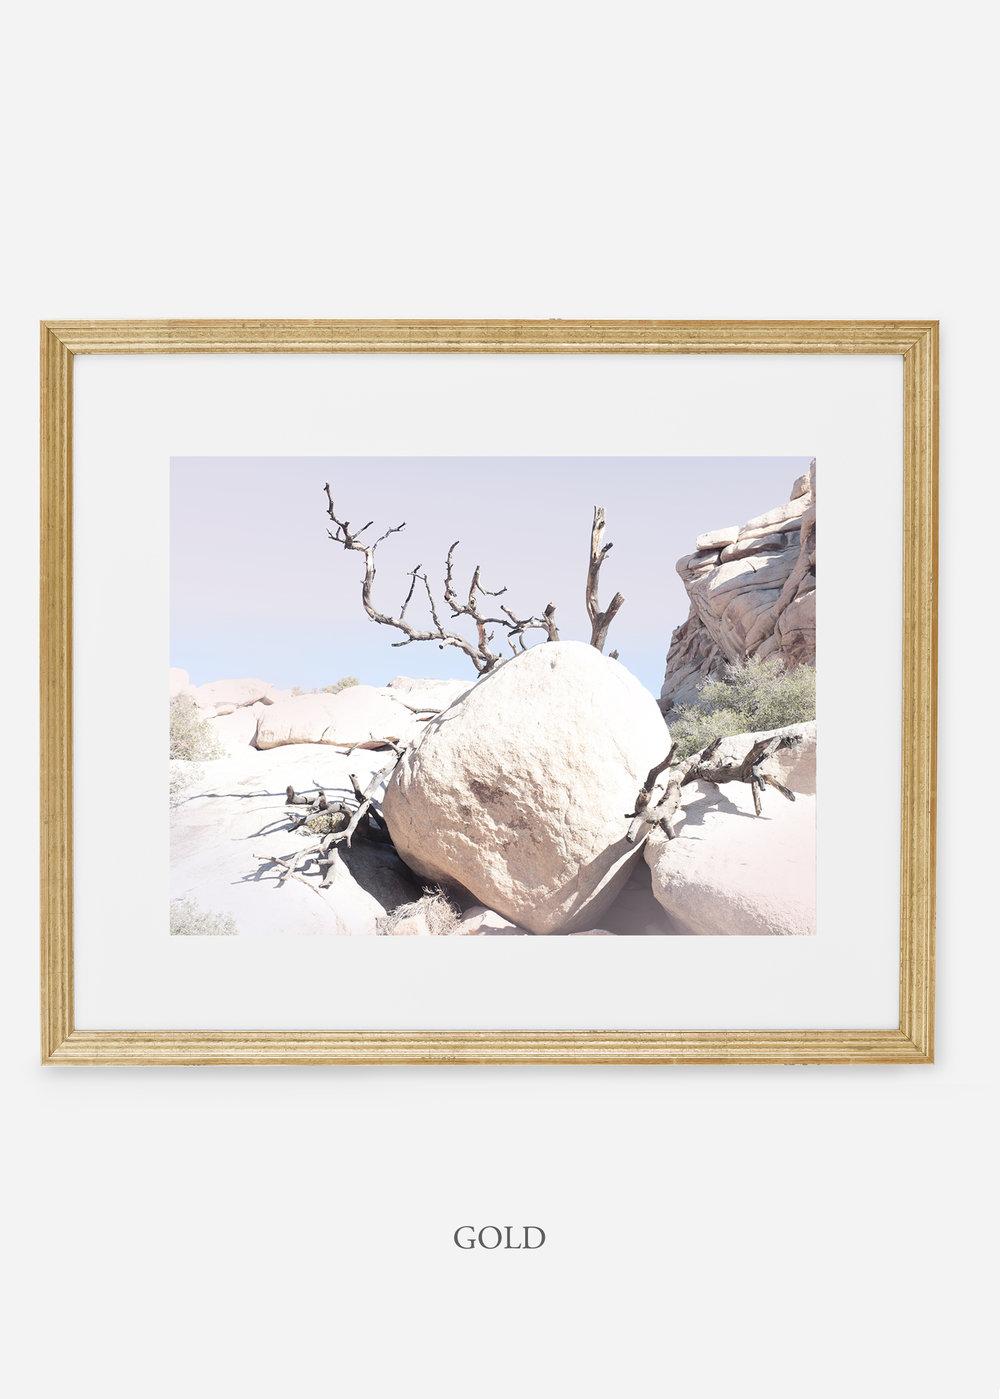 WilderCalifornia_gold_JoshuaTree_No.17_interiordesign_prints_art.jpg